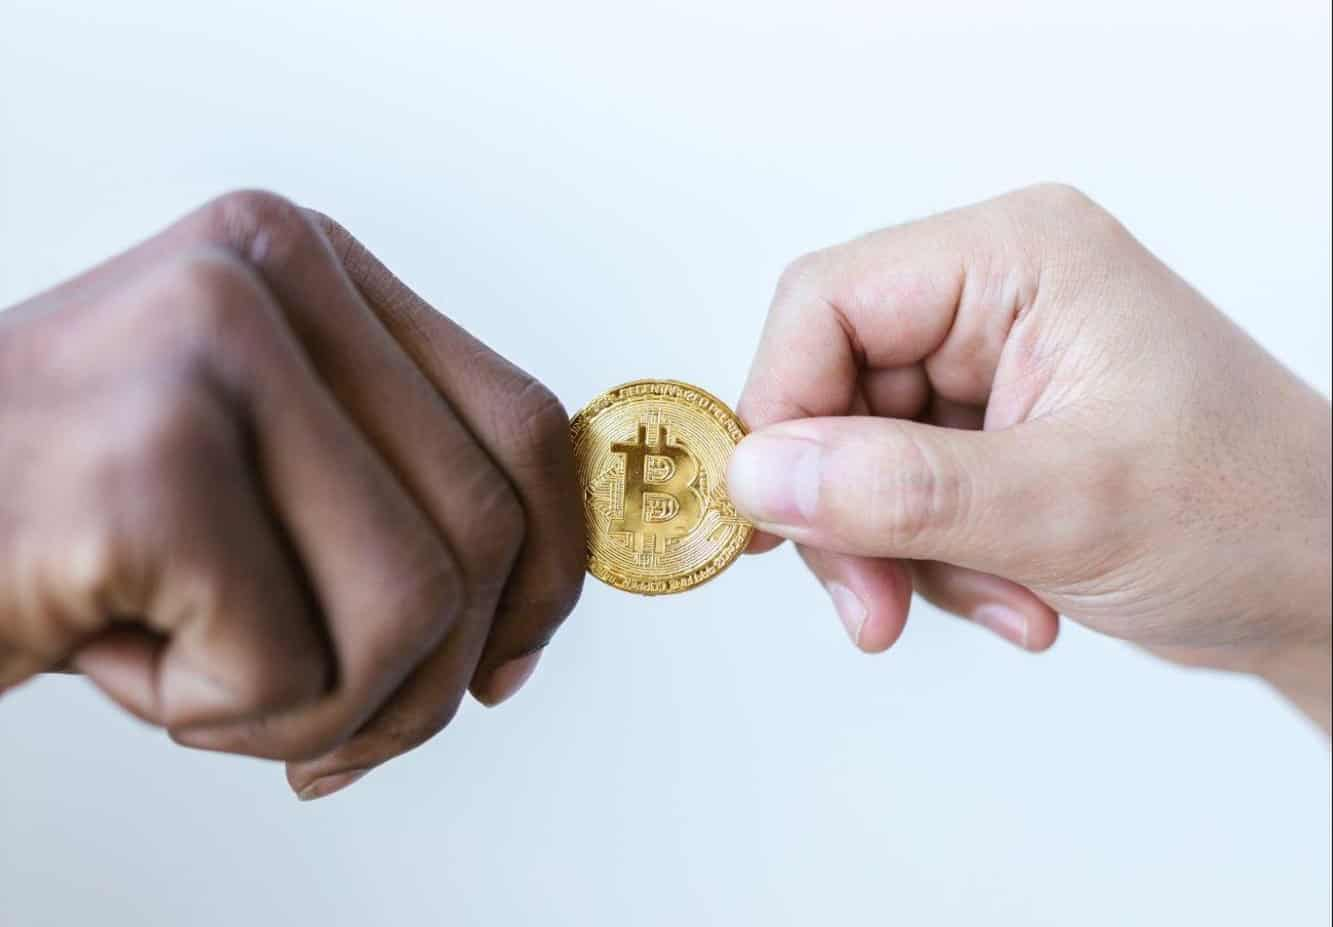 Bitcoin image 9484934